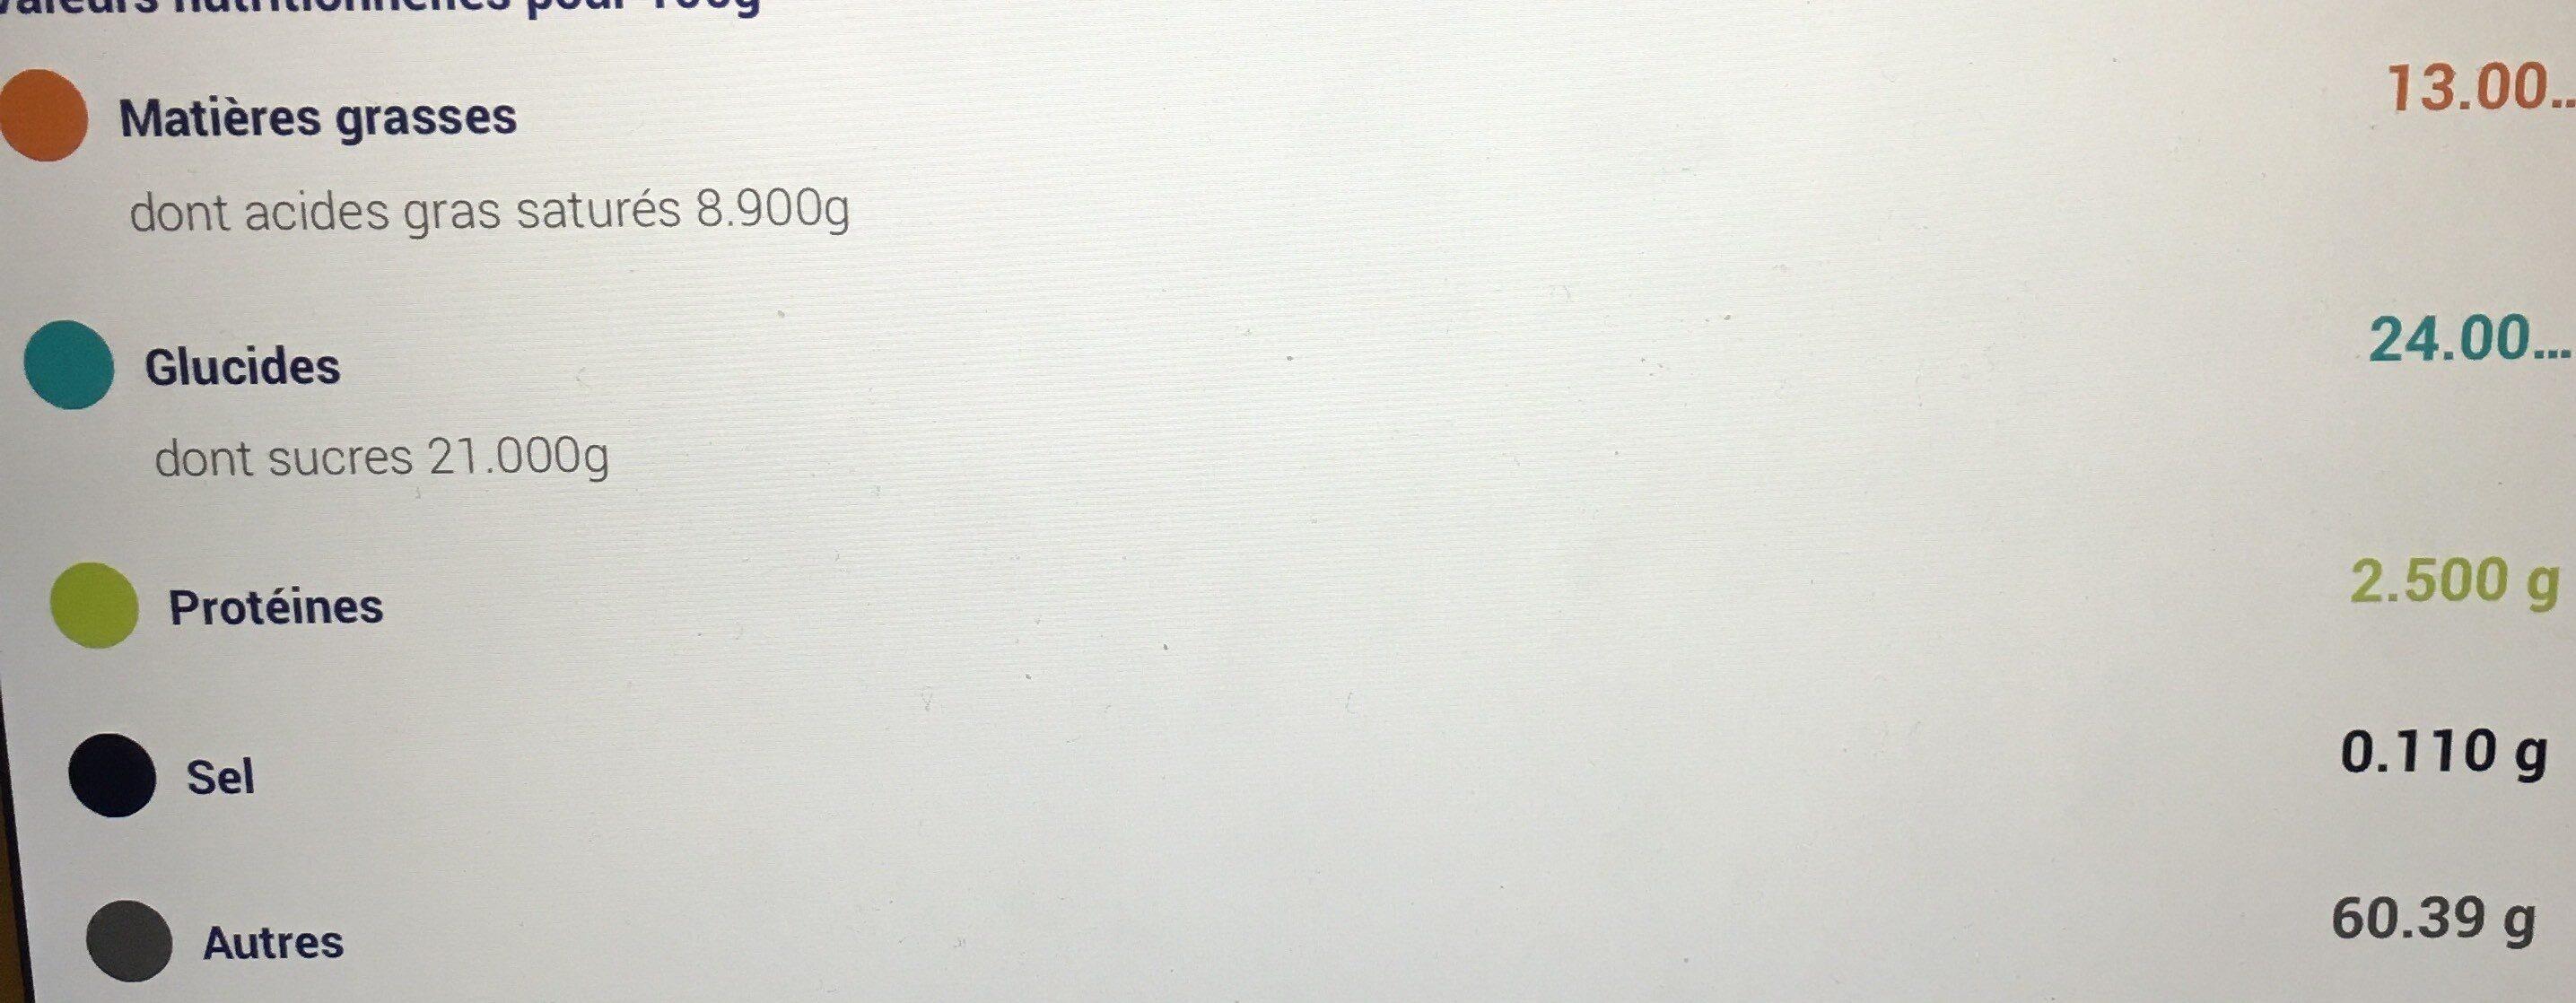 Magnum Glace Bâtonnet Mania x8 880ml - Valori nutrizionali - fr